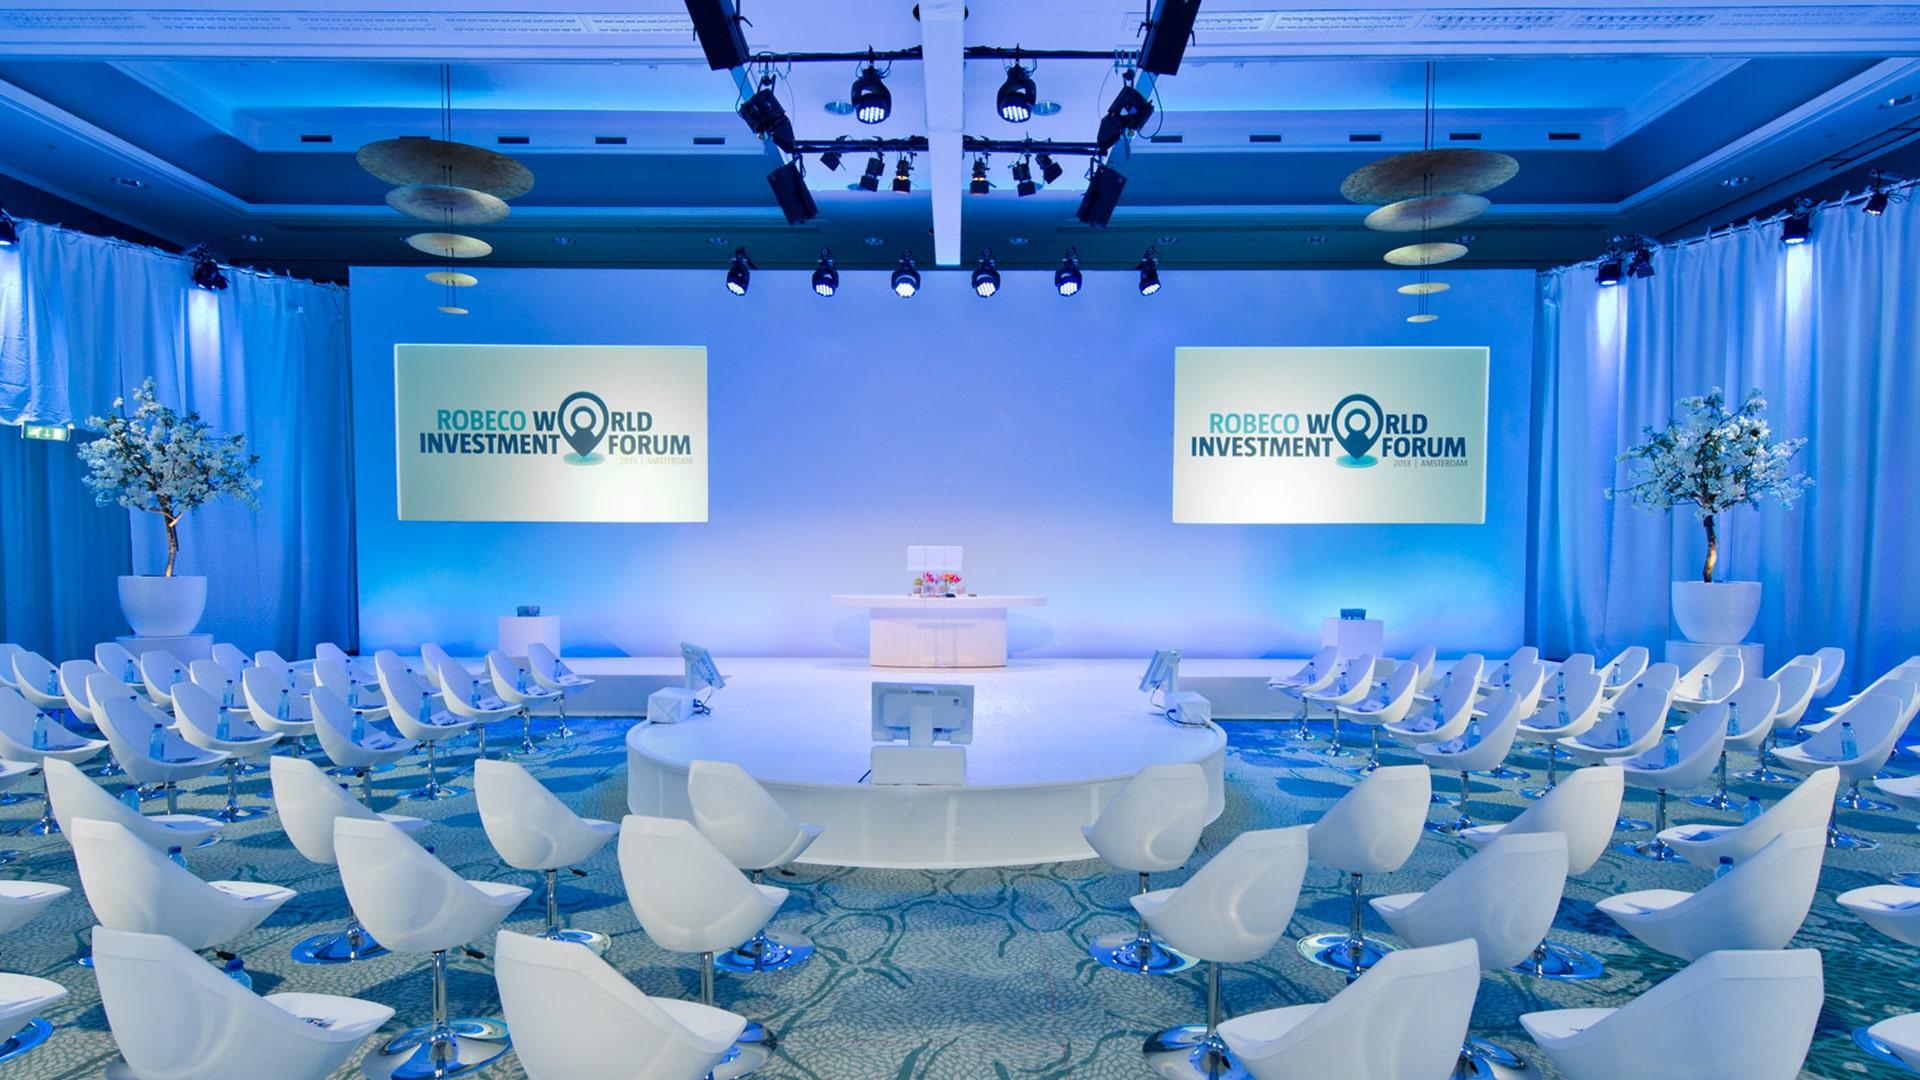 Robeco World Investment Forum 2013